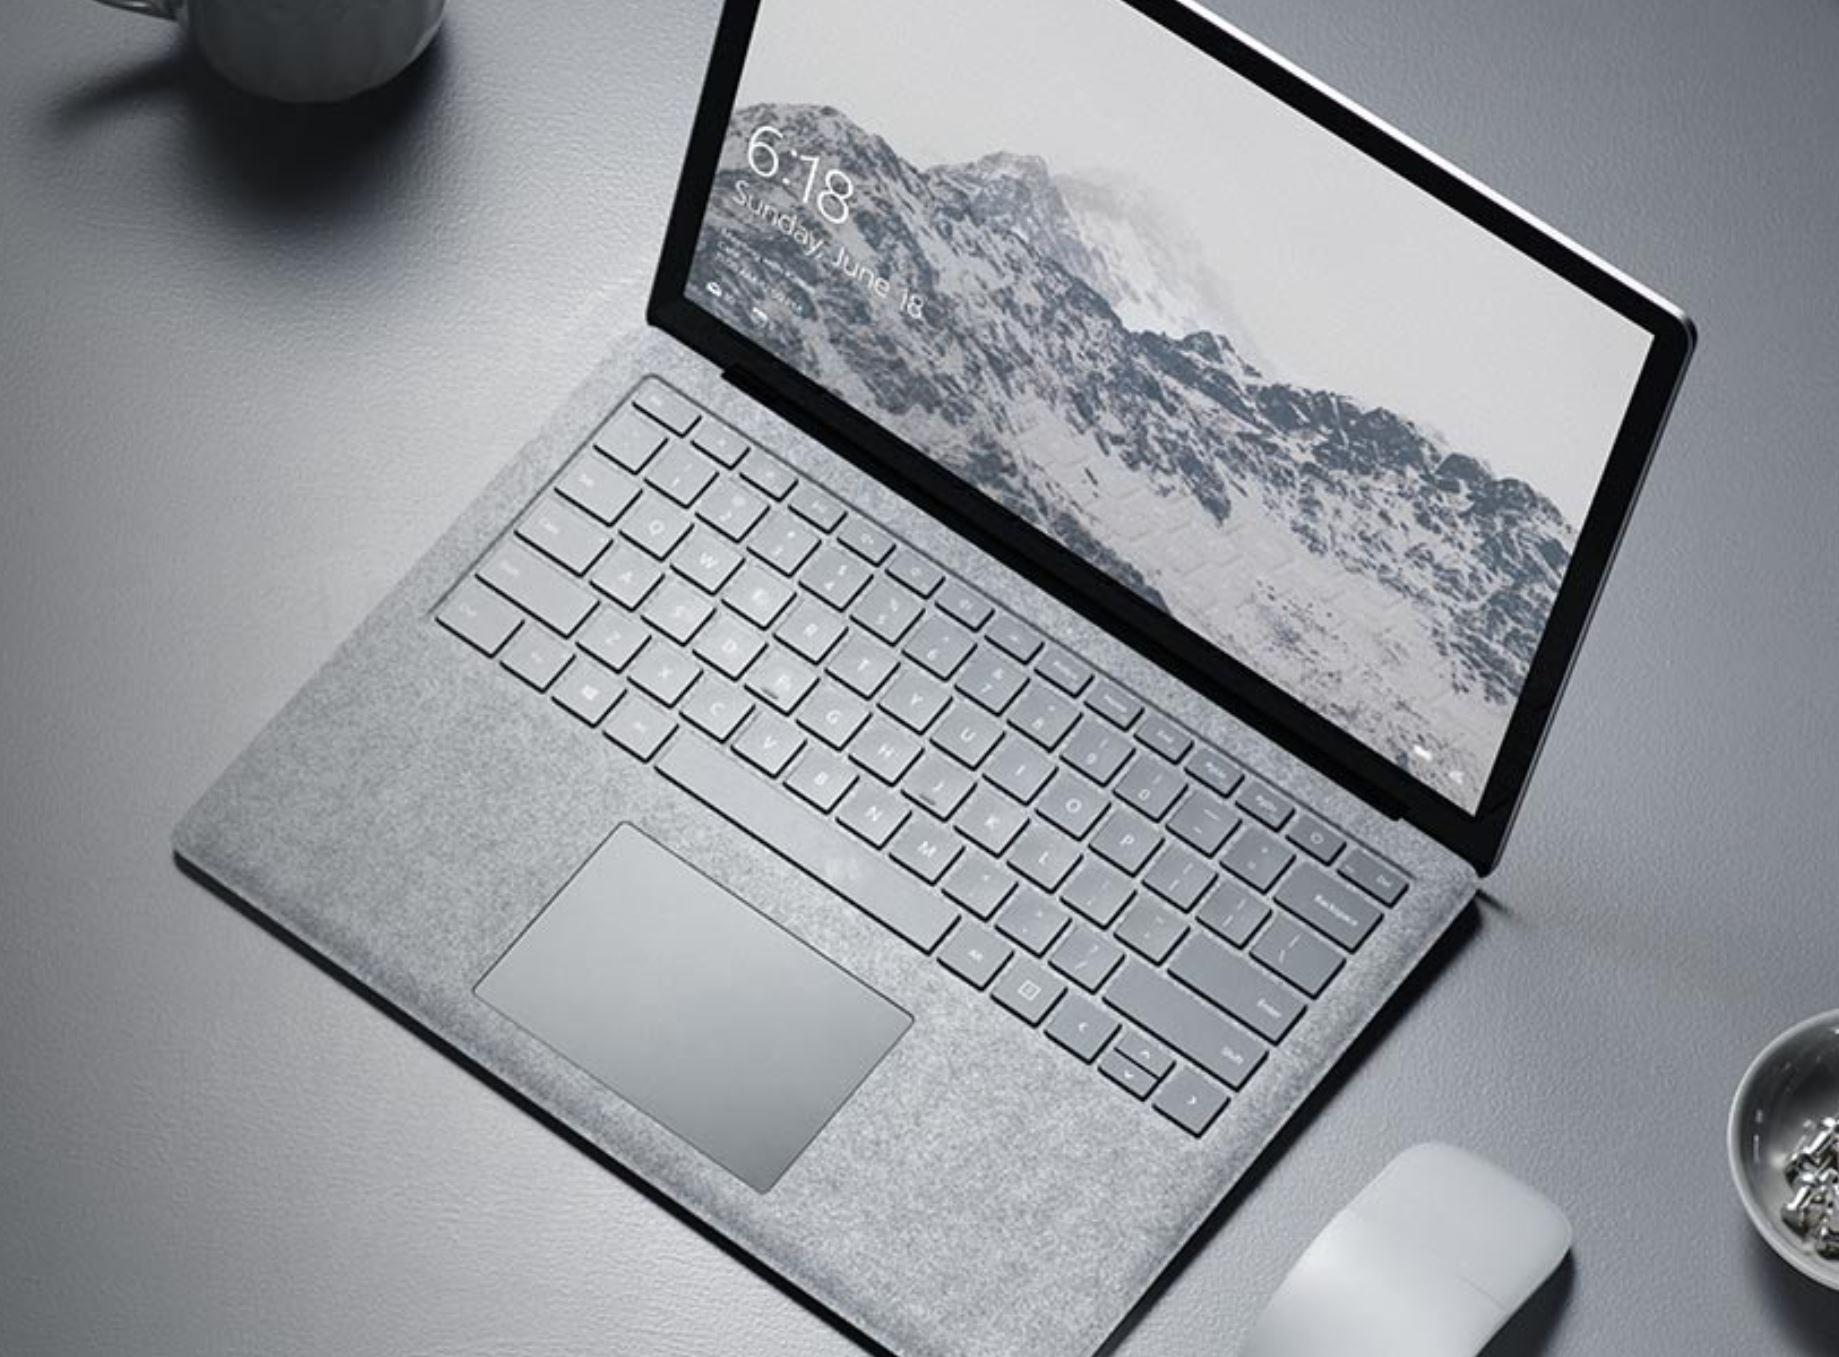 Signature Alcantara Type Cover Surface Pro